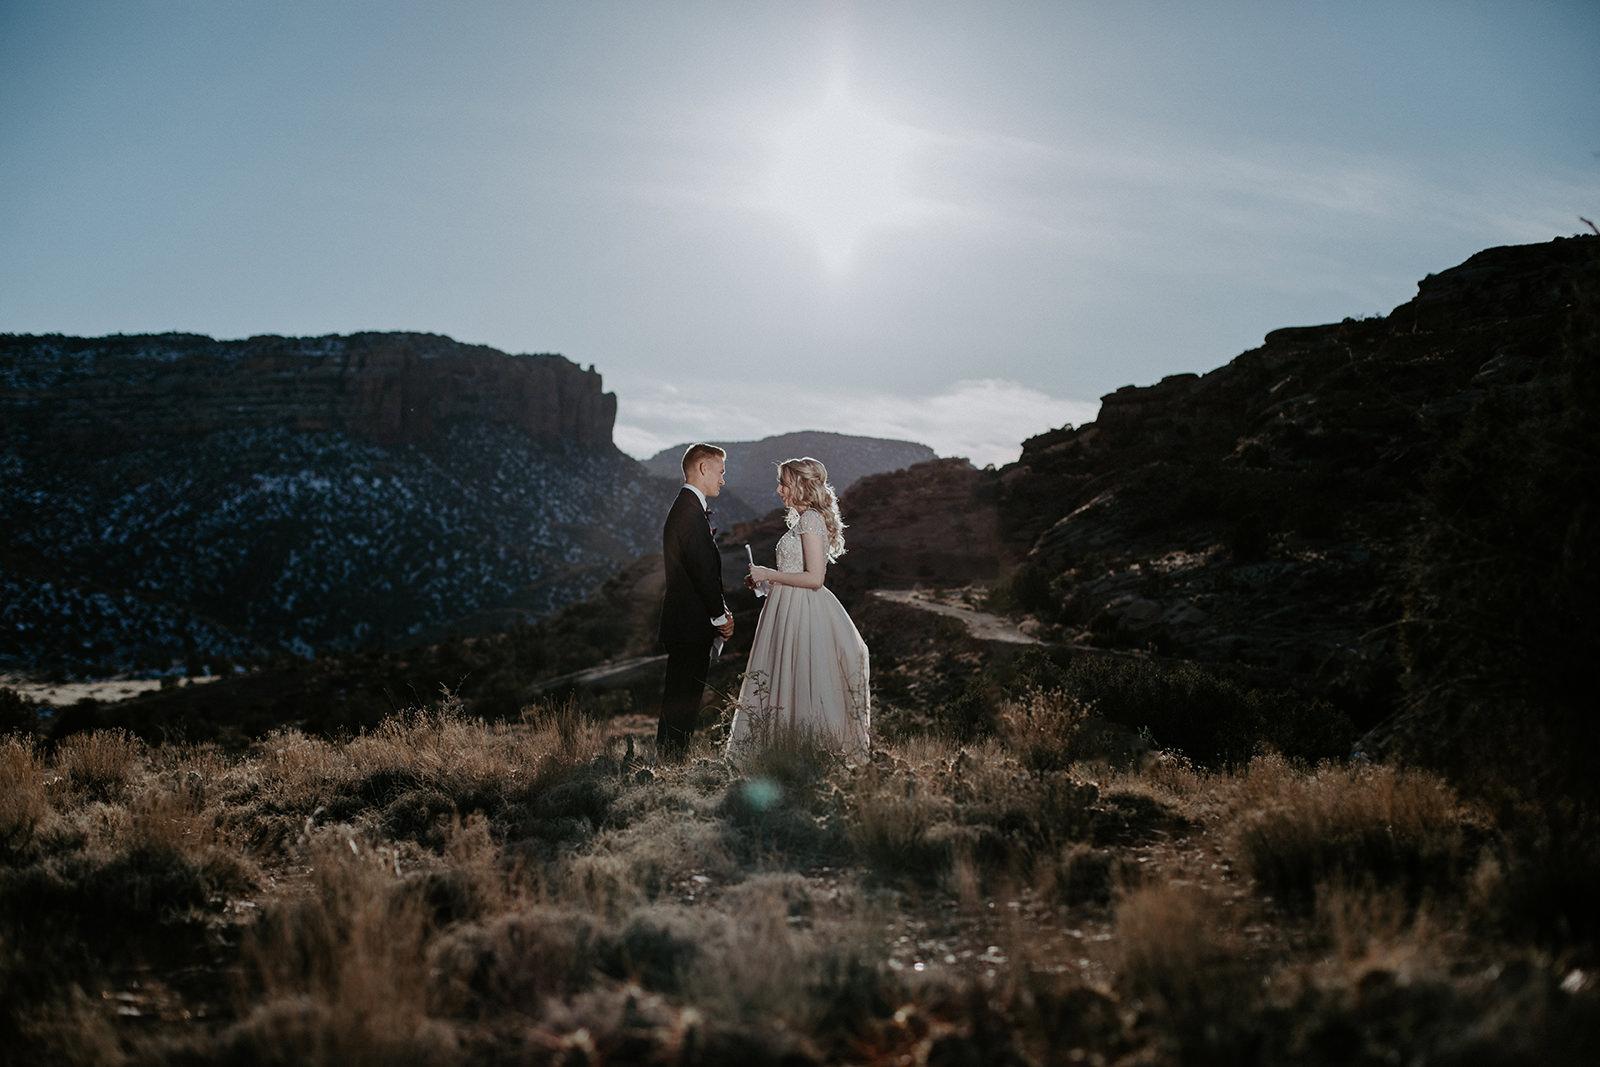 Wide view of bride in white dress and groom in dark blue suit in desert